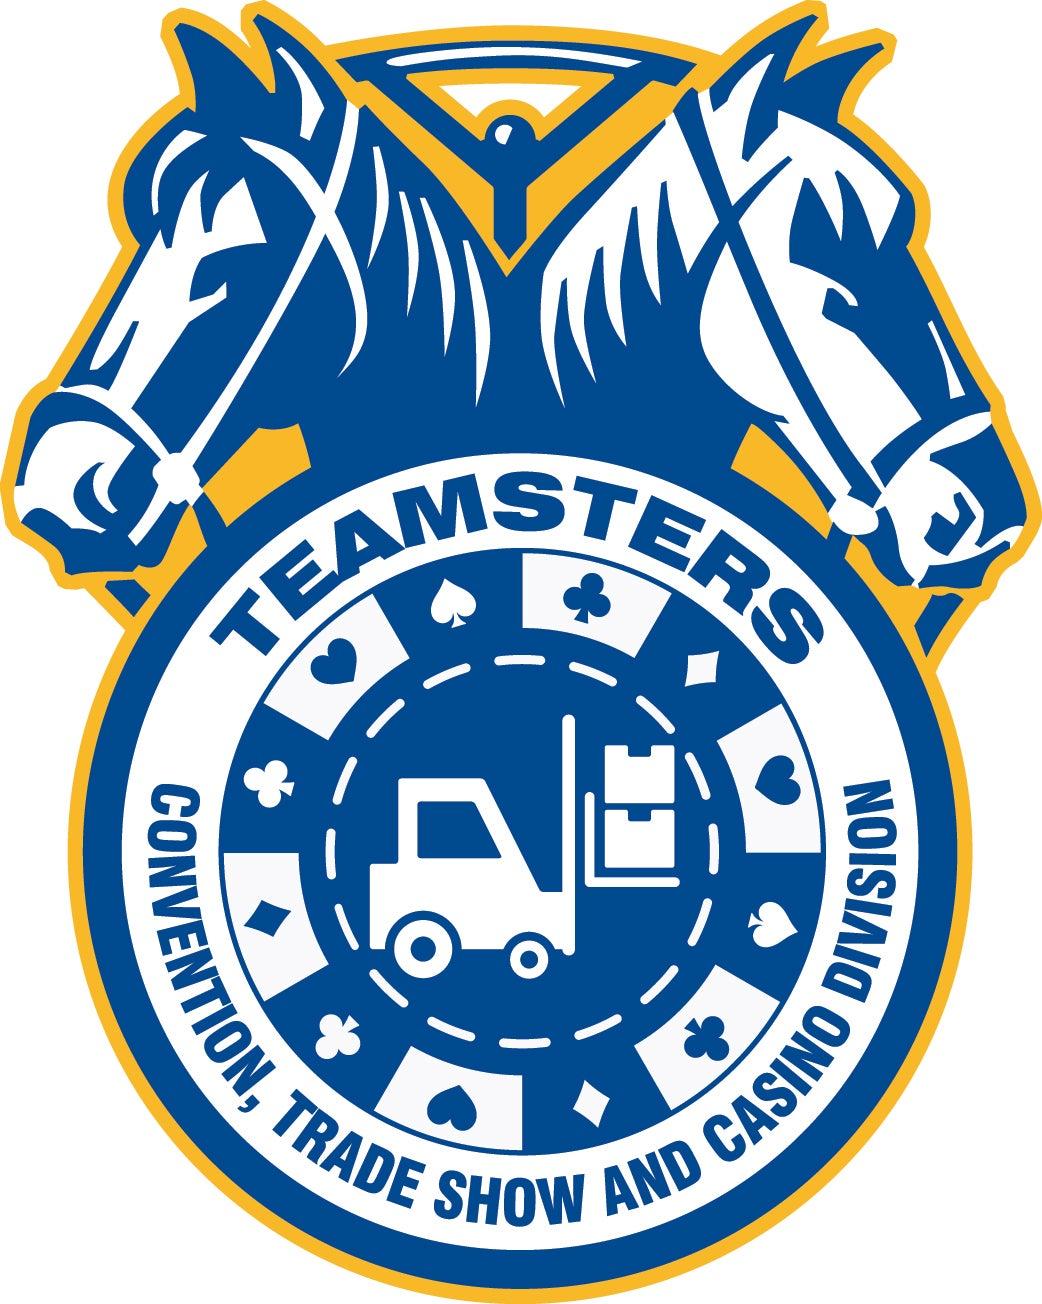 Convention, Trade Show and Casino Division Logo